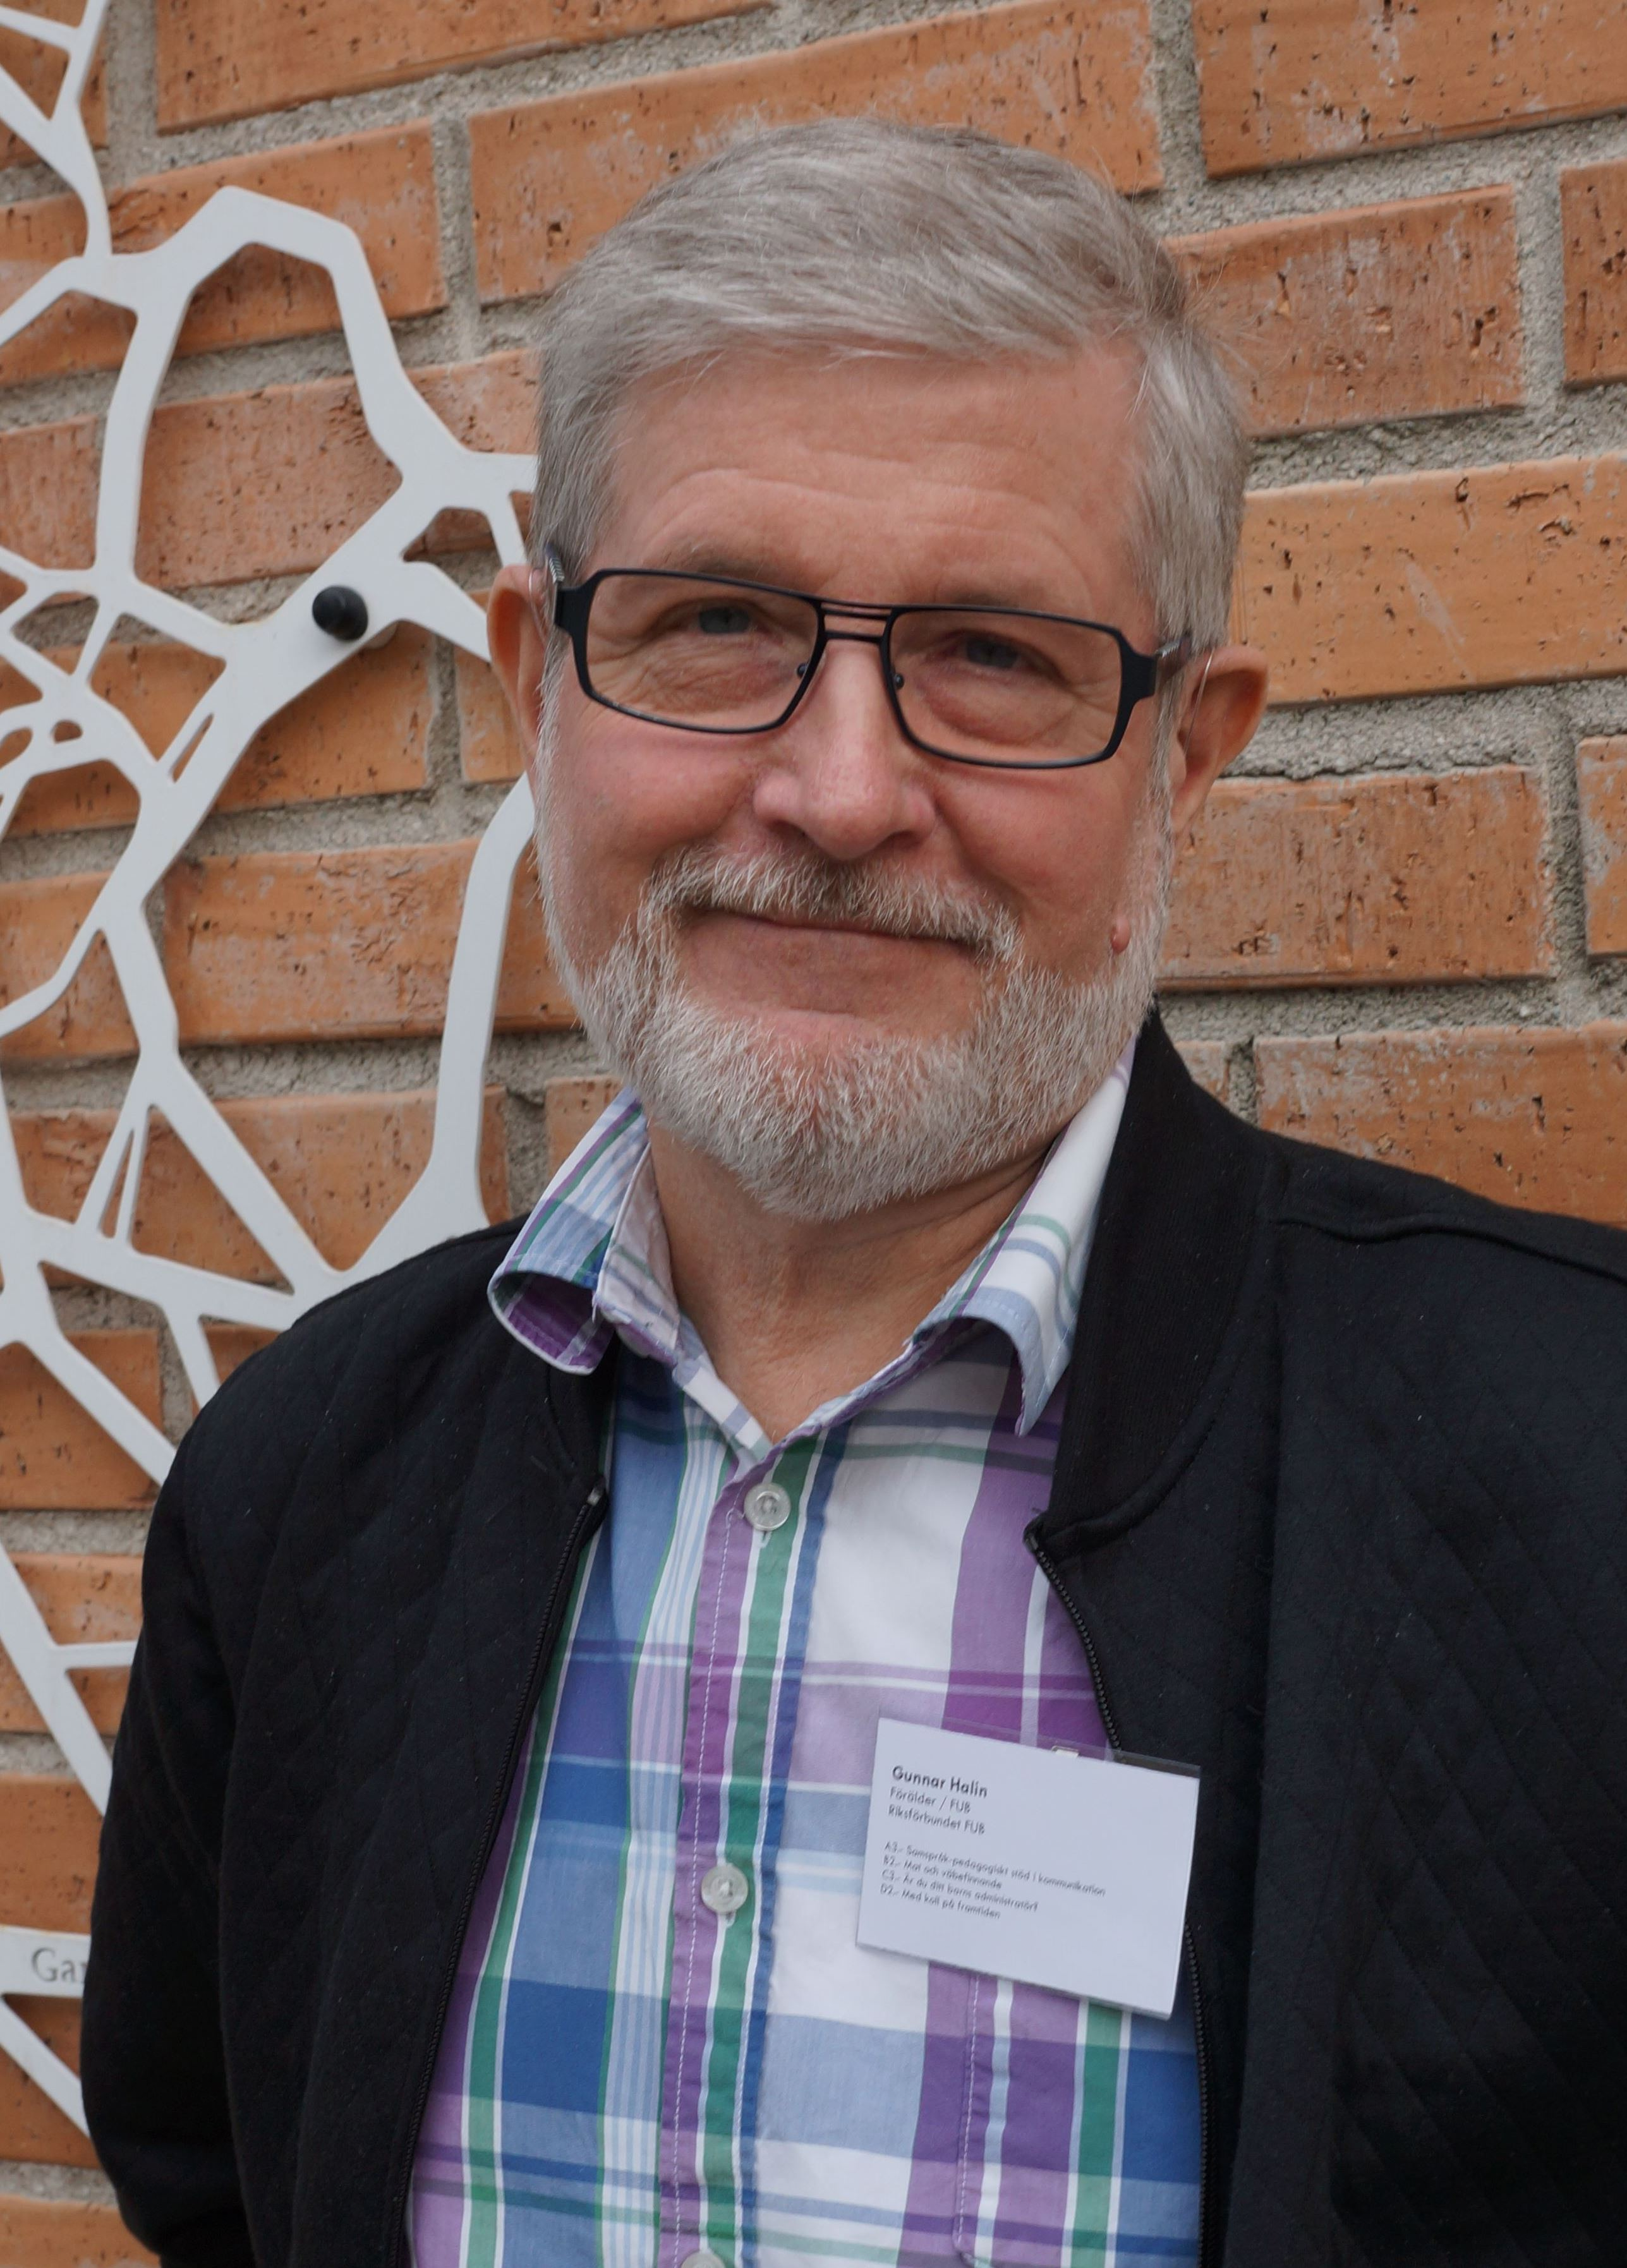 Gunnar Halin